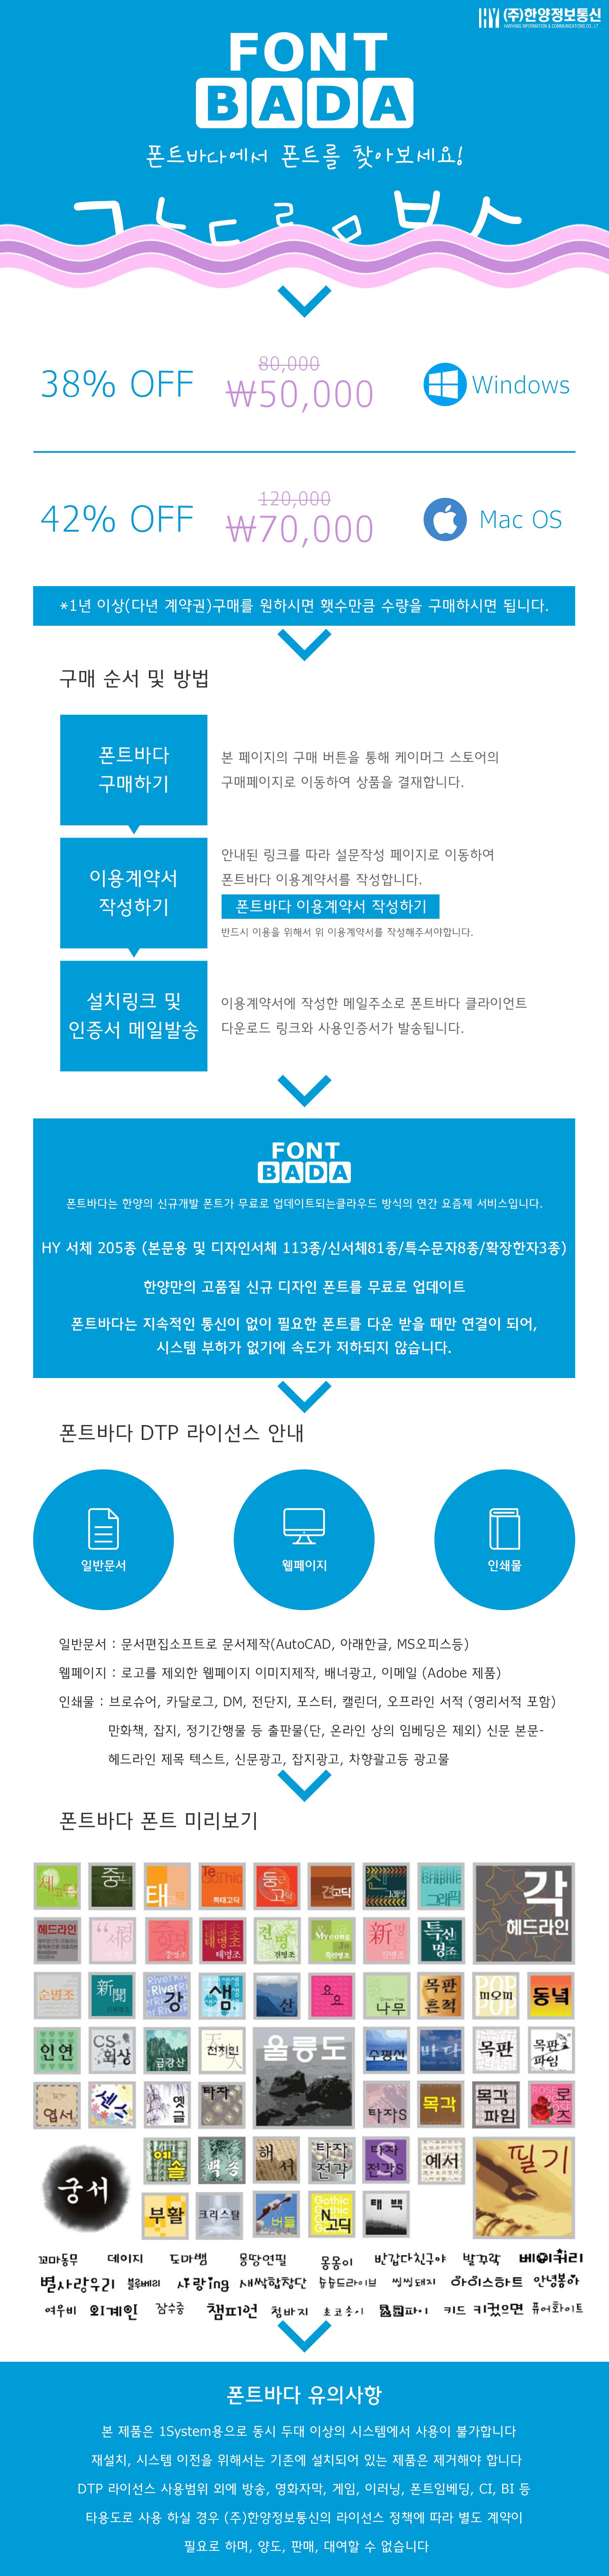 data_event_1430990530